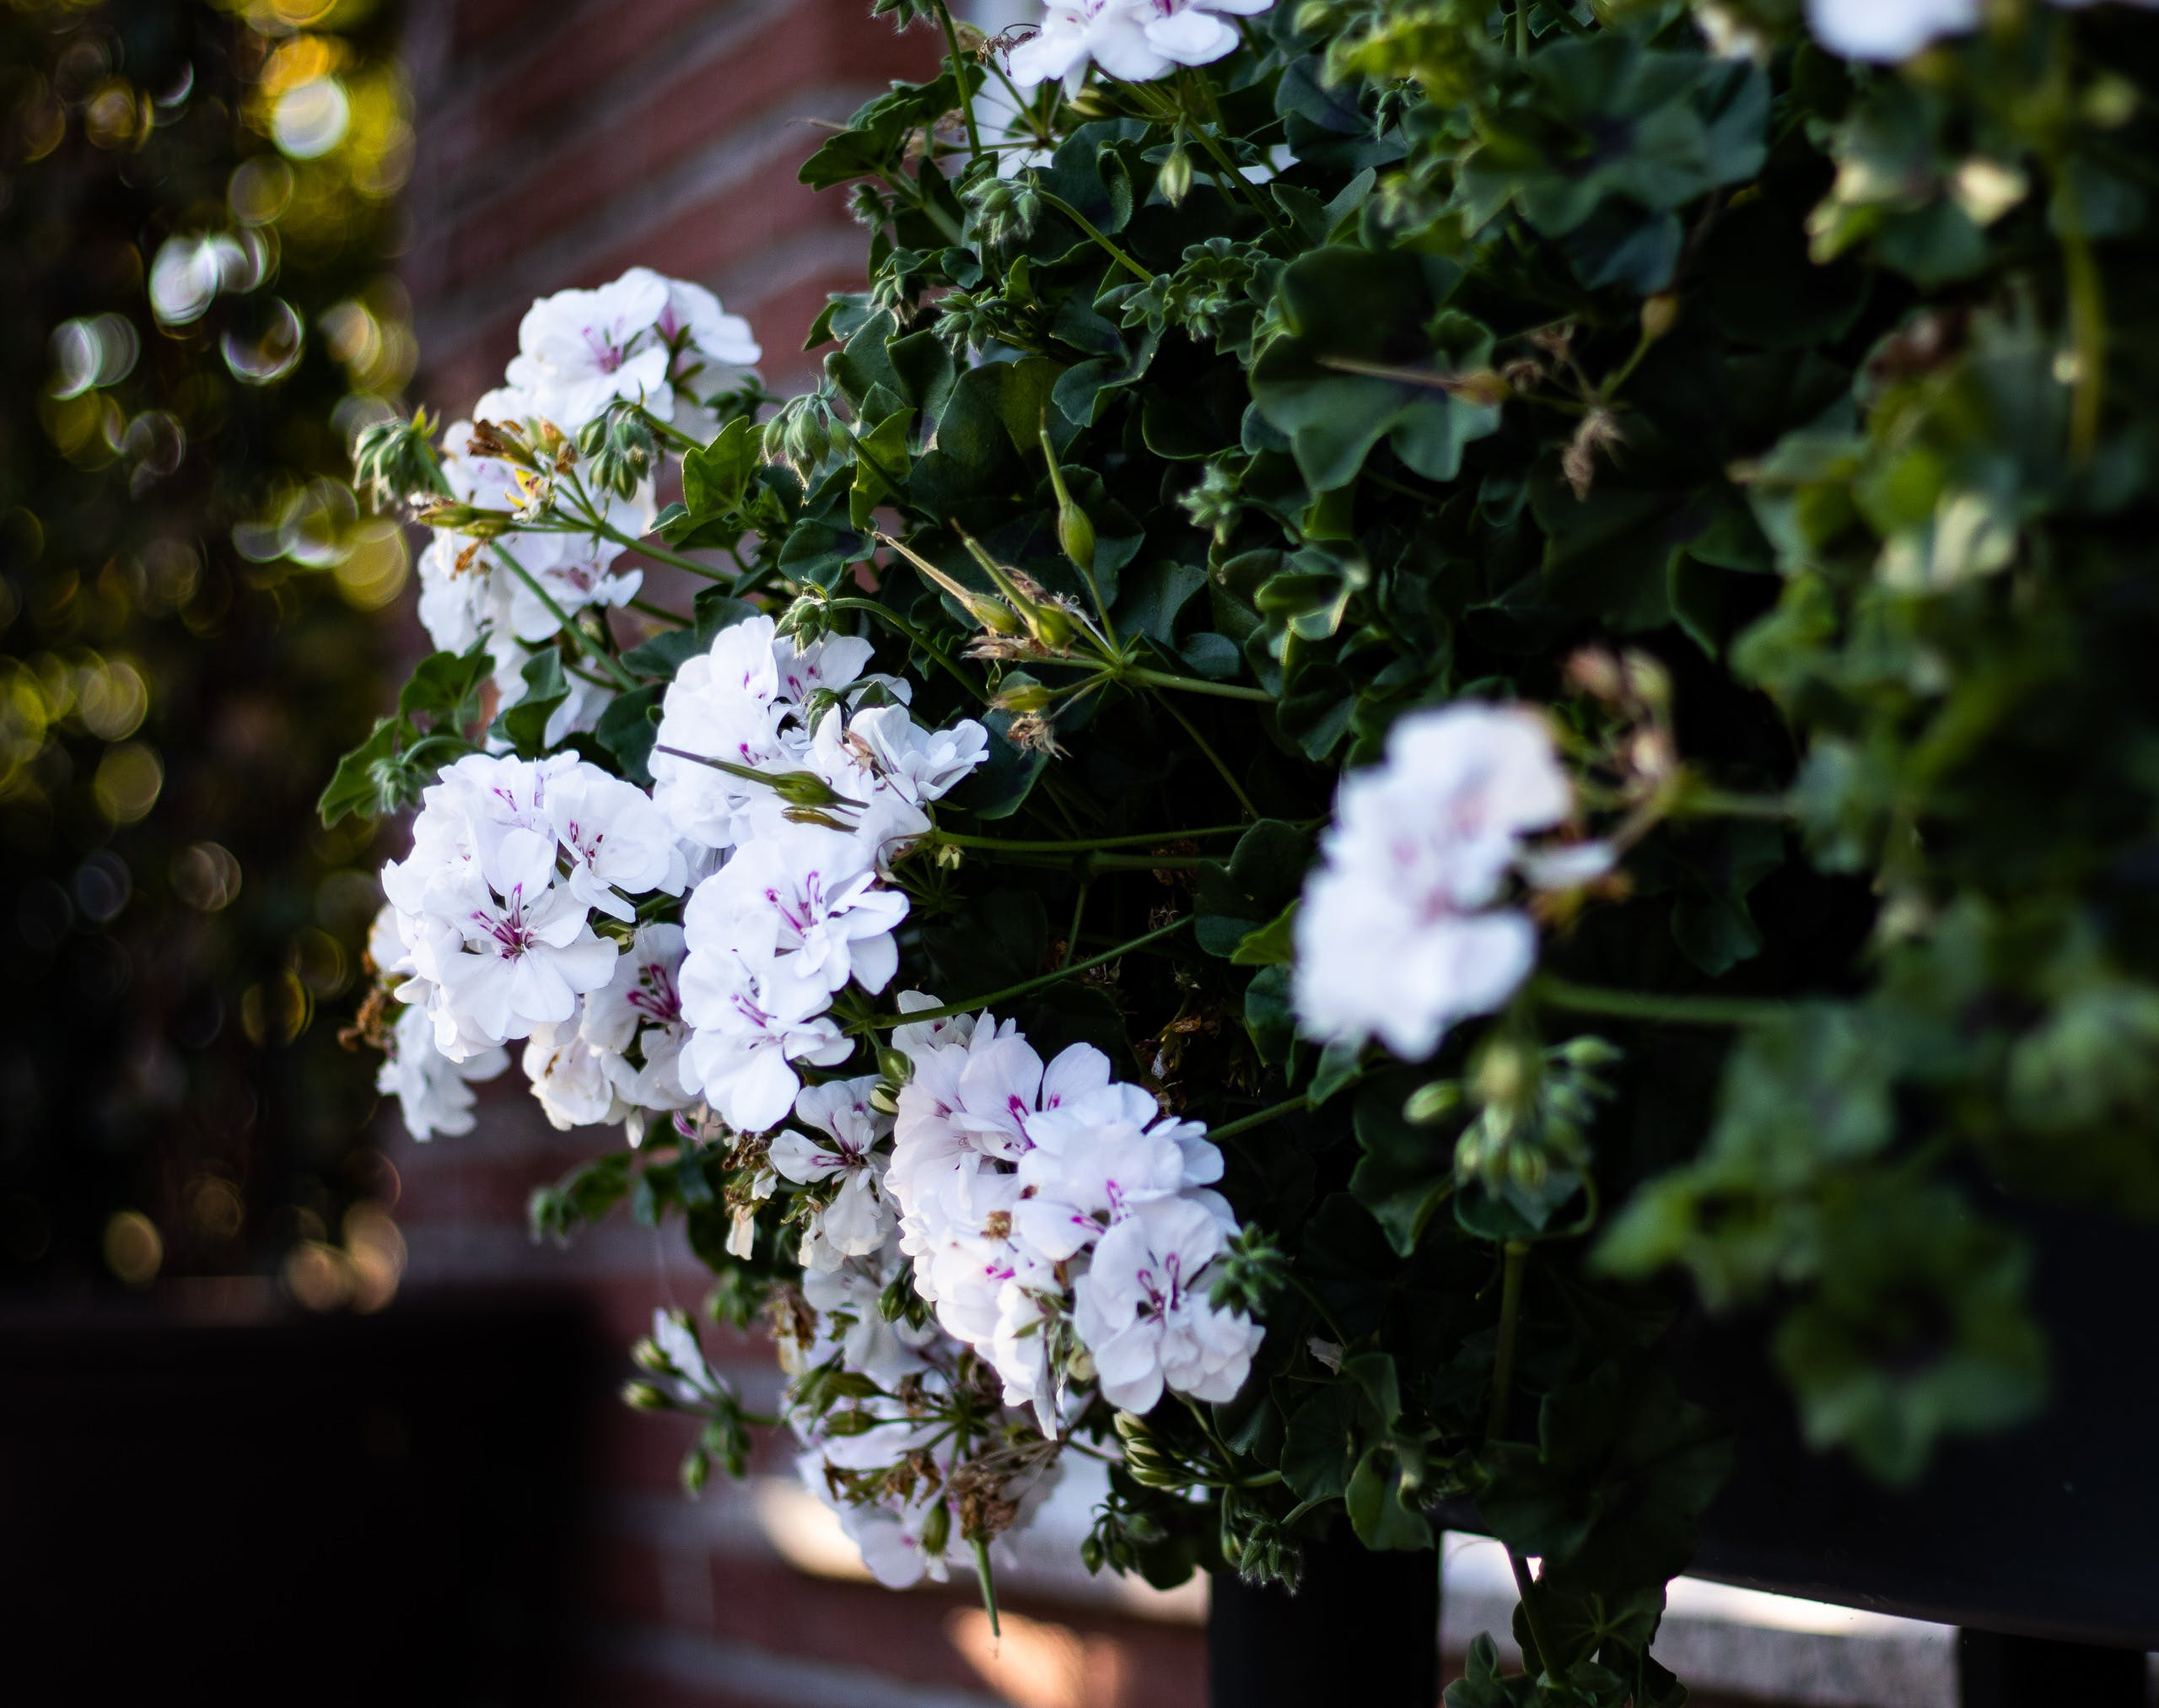 Free stock photo of beautiful flowers, flower, flower garden, garden